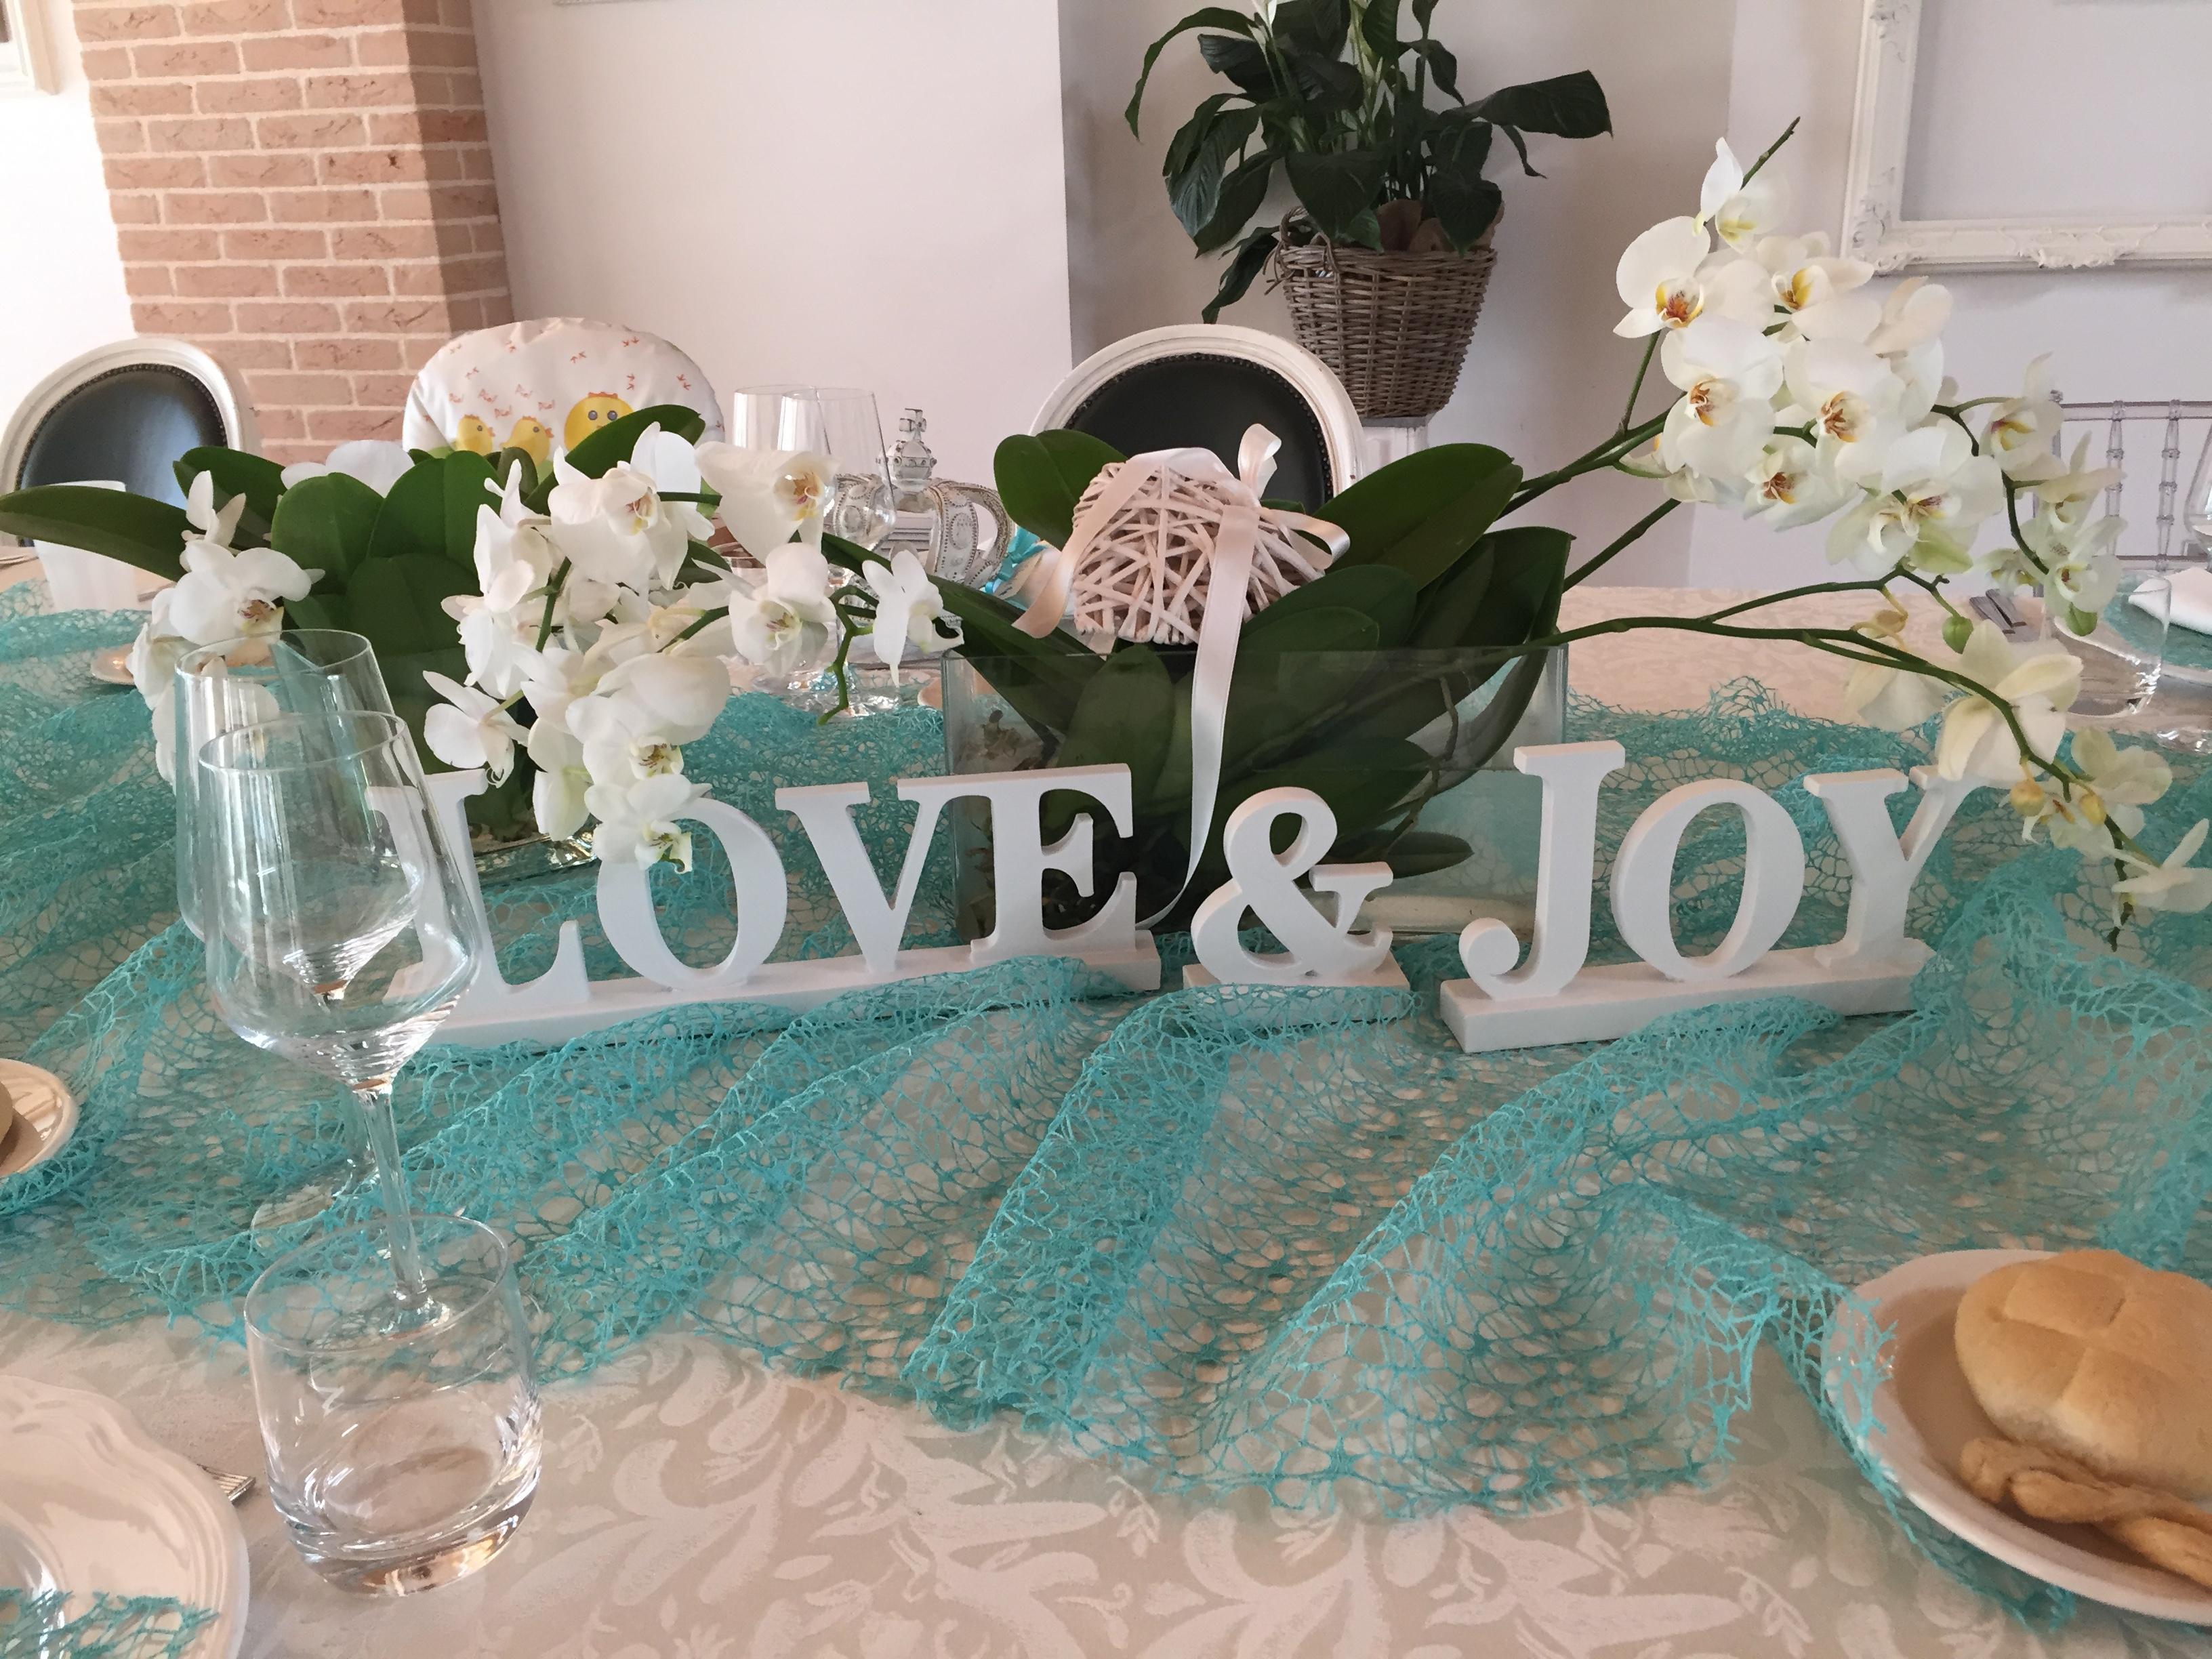 tavola imbandita in ristorante per matrimoni e cerimonie